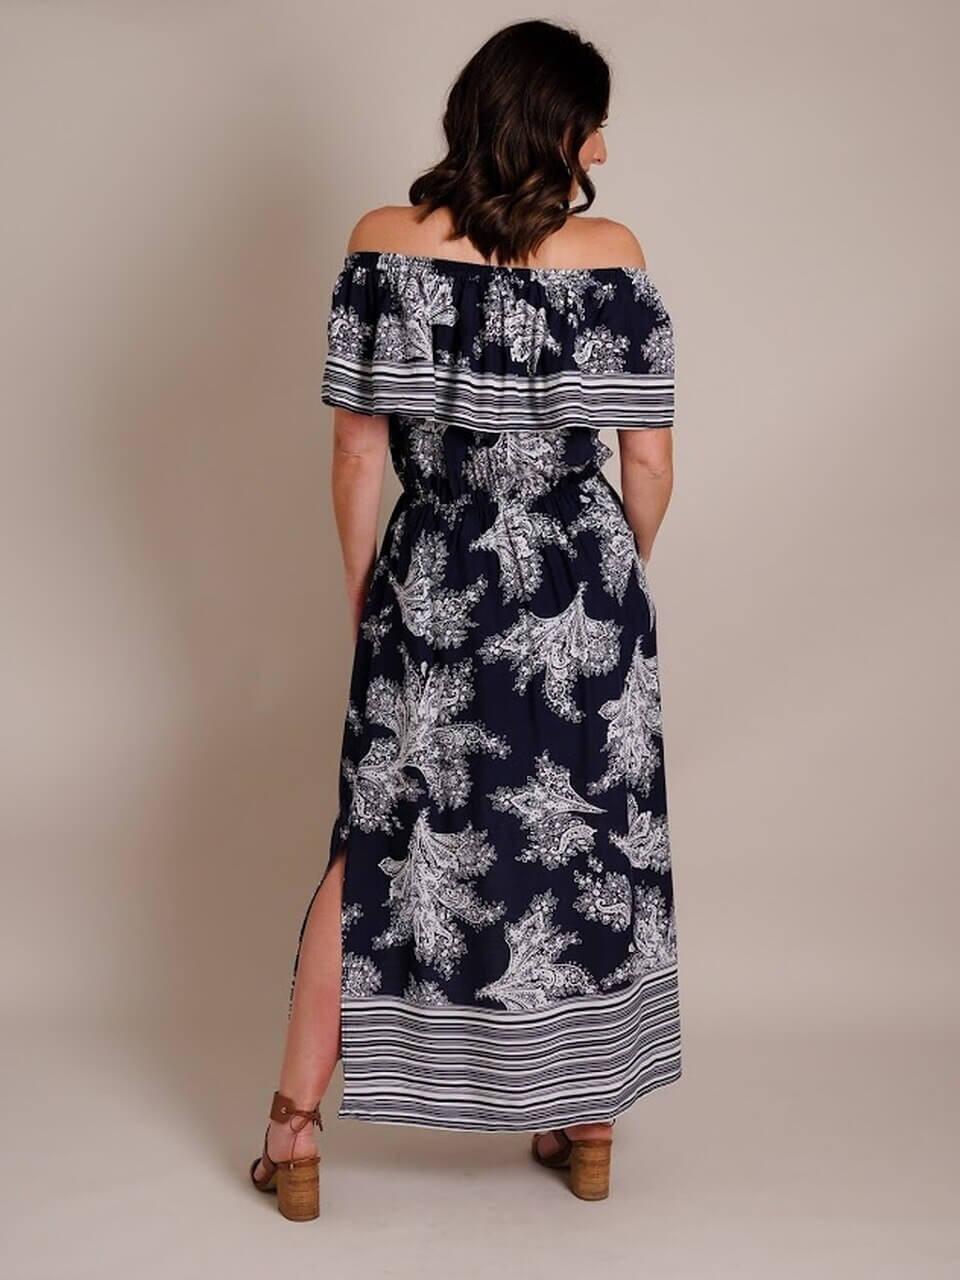 miller st. boutique Stripe Border Dress back view